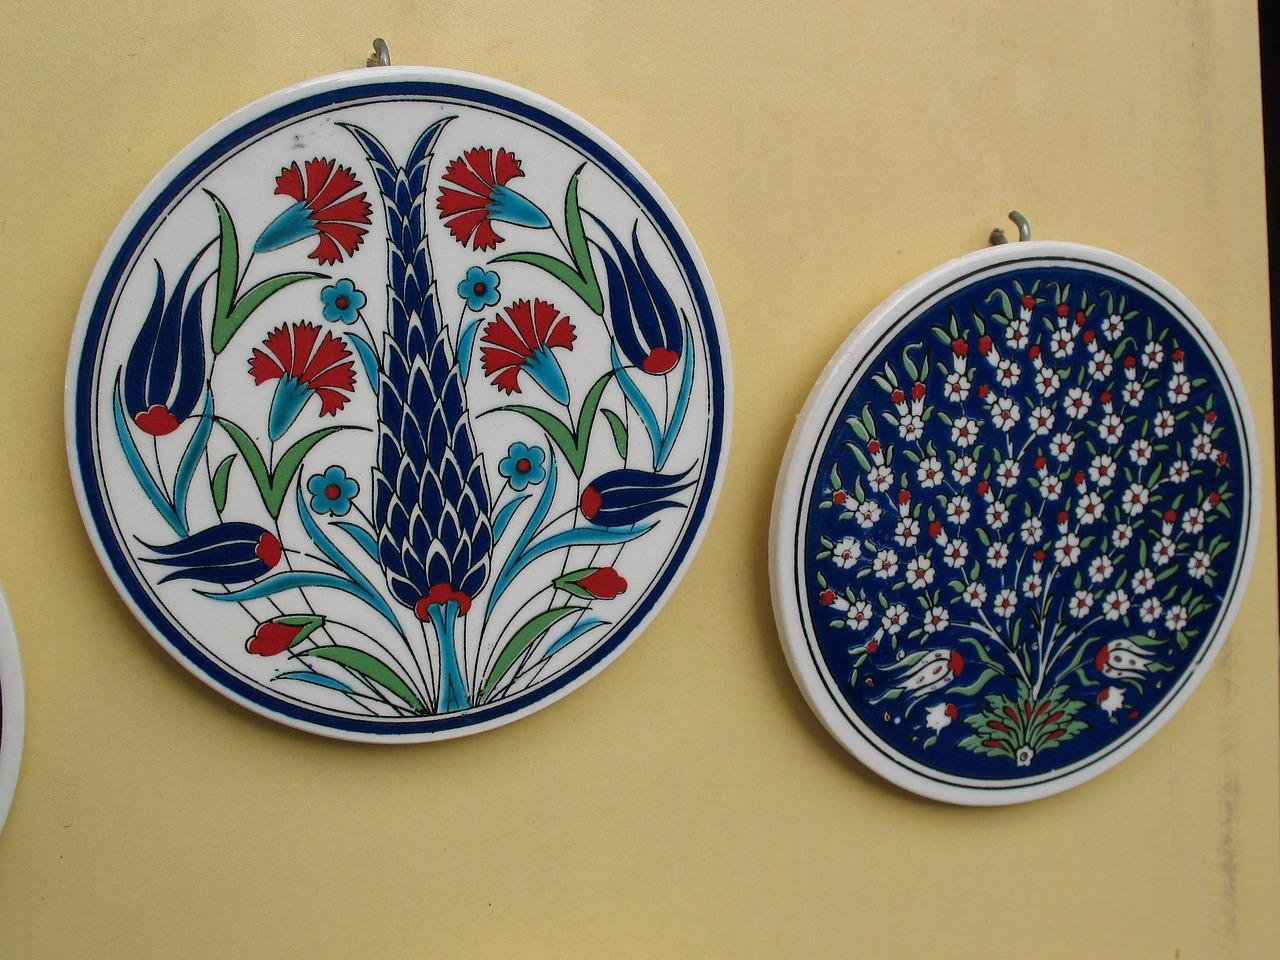 Plate Handmade Arts And Crafts Turkey Painting Free Image From Needpix Com